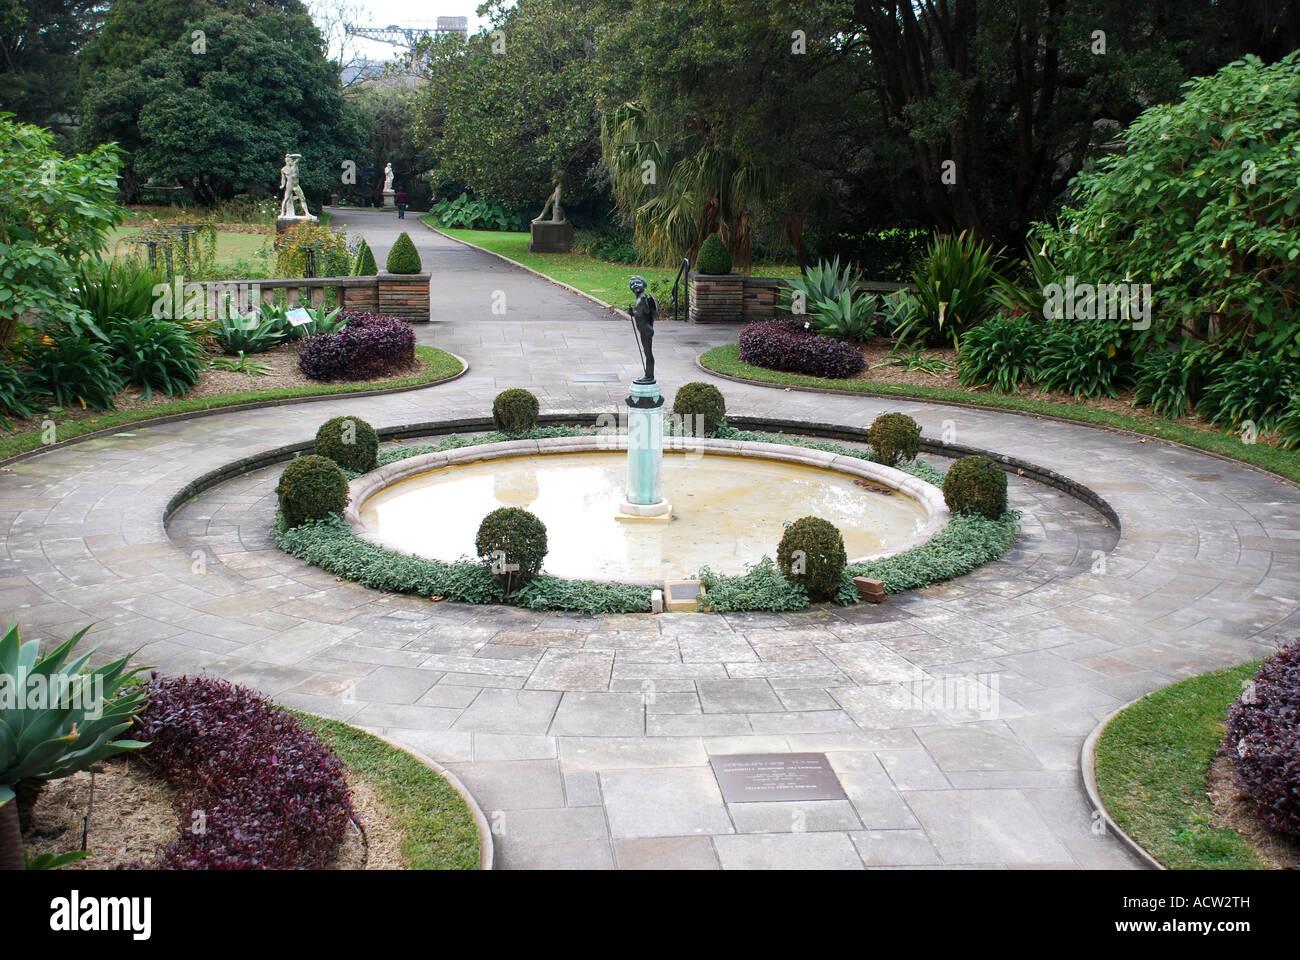 Water feature in botanical gardens sydney australia stock for Garden features australia